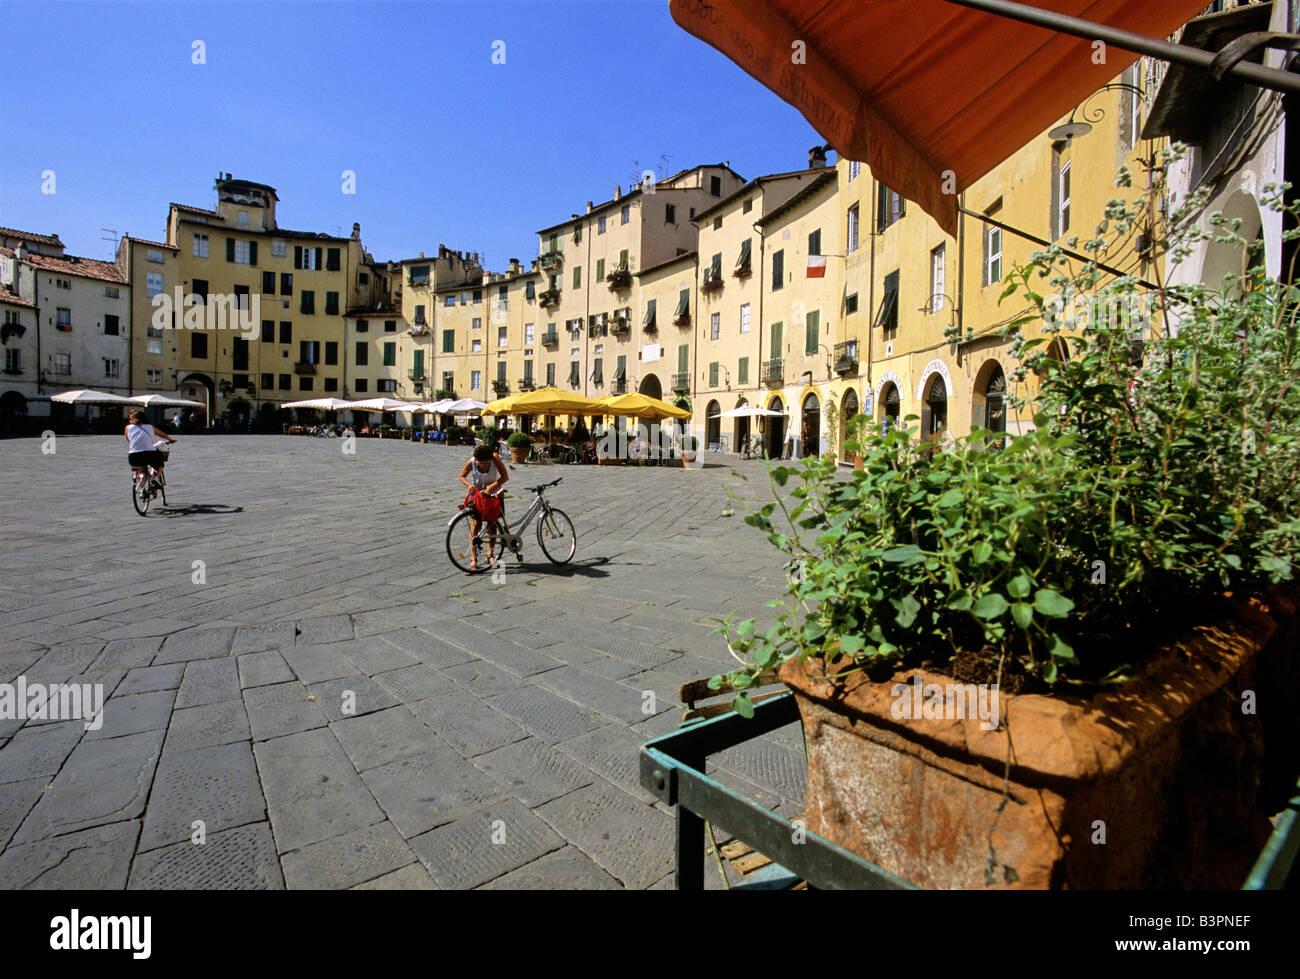 Piazza del Anfiteatro, Piazza Mercato, Ampitheatre, Lucca, Tuscany, Italy, Europe - Stock Image